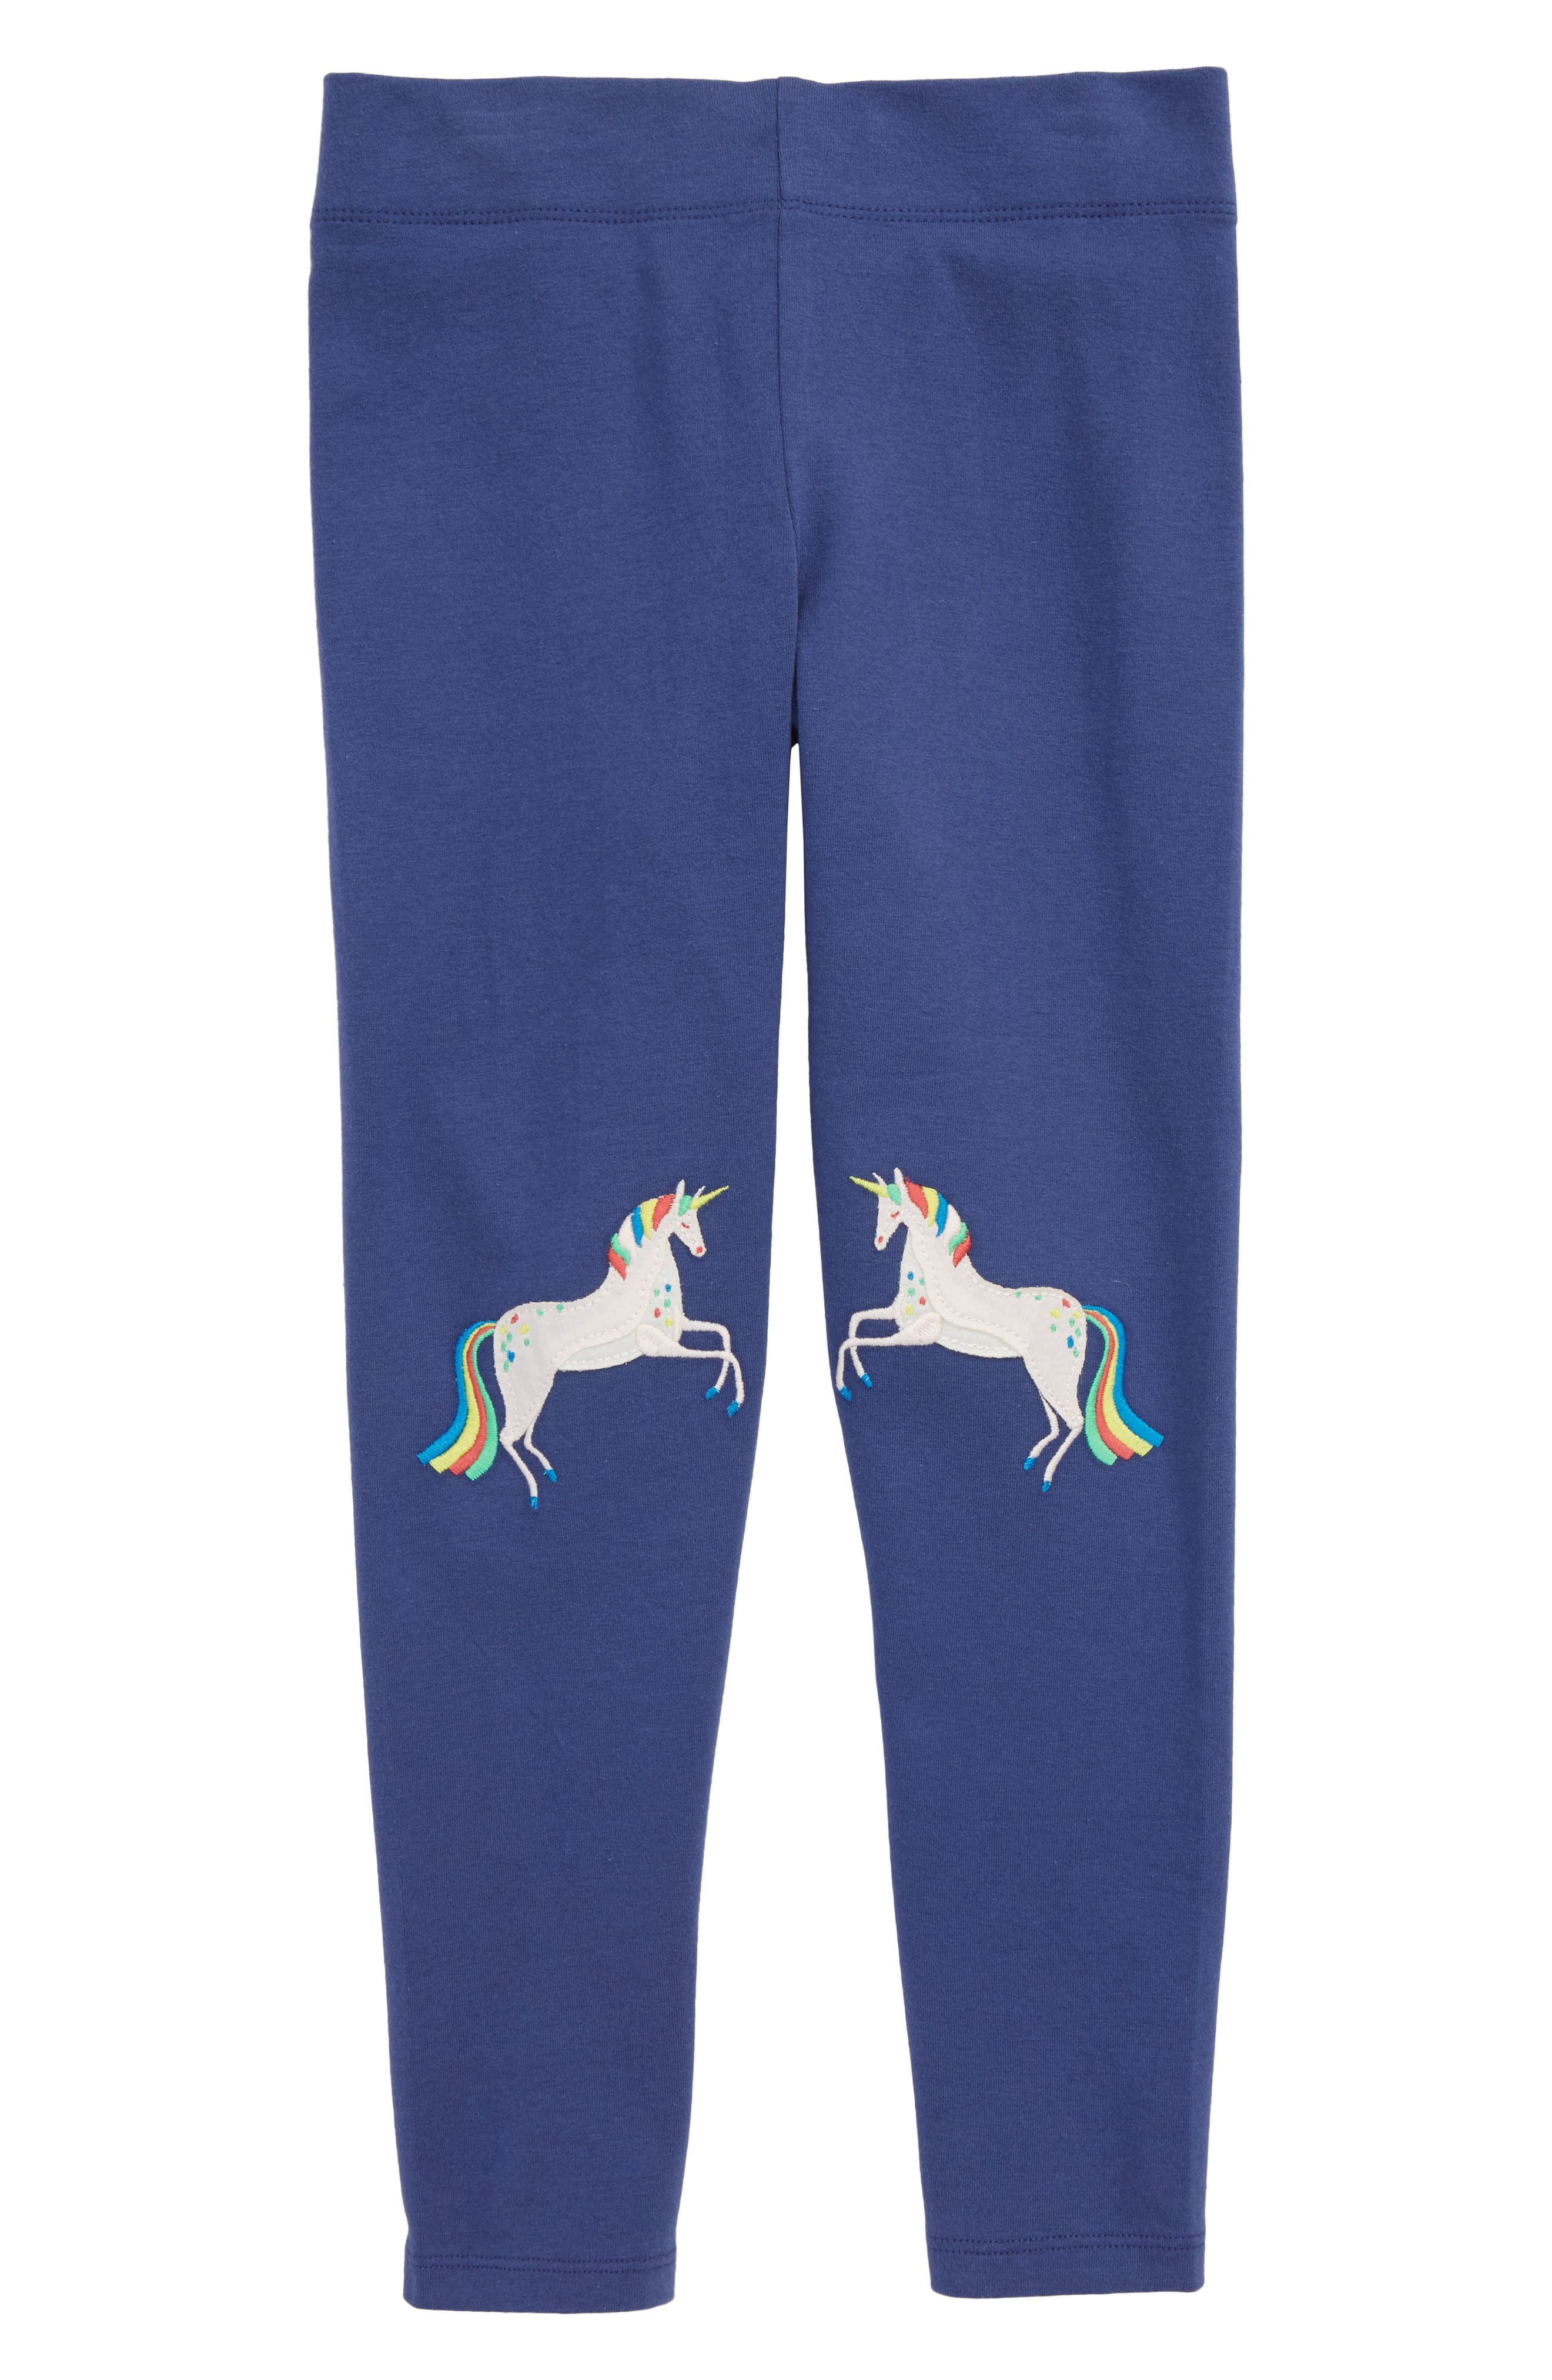 Appliqué Leggings,                             Main thumbnail 1, color,                             Navstarboard Blue Unicorns